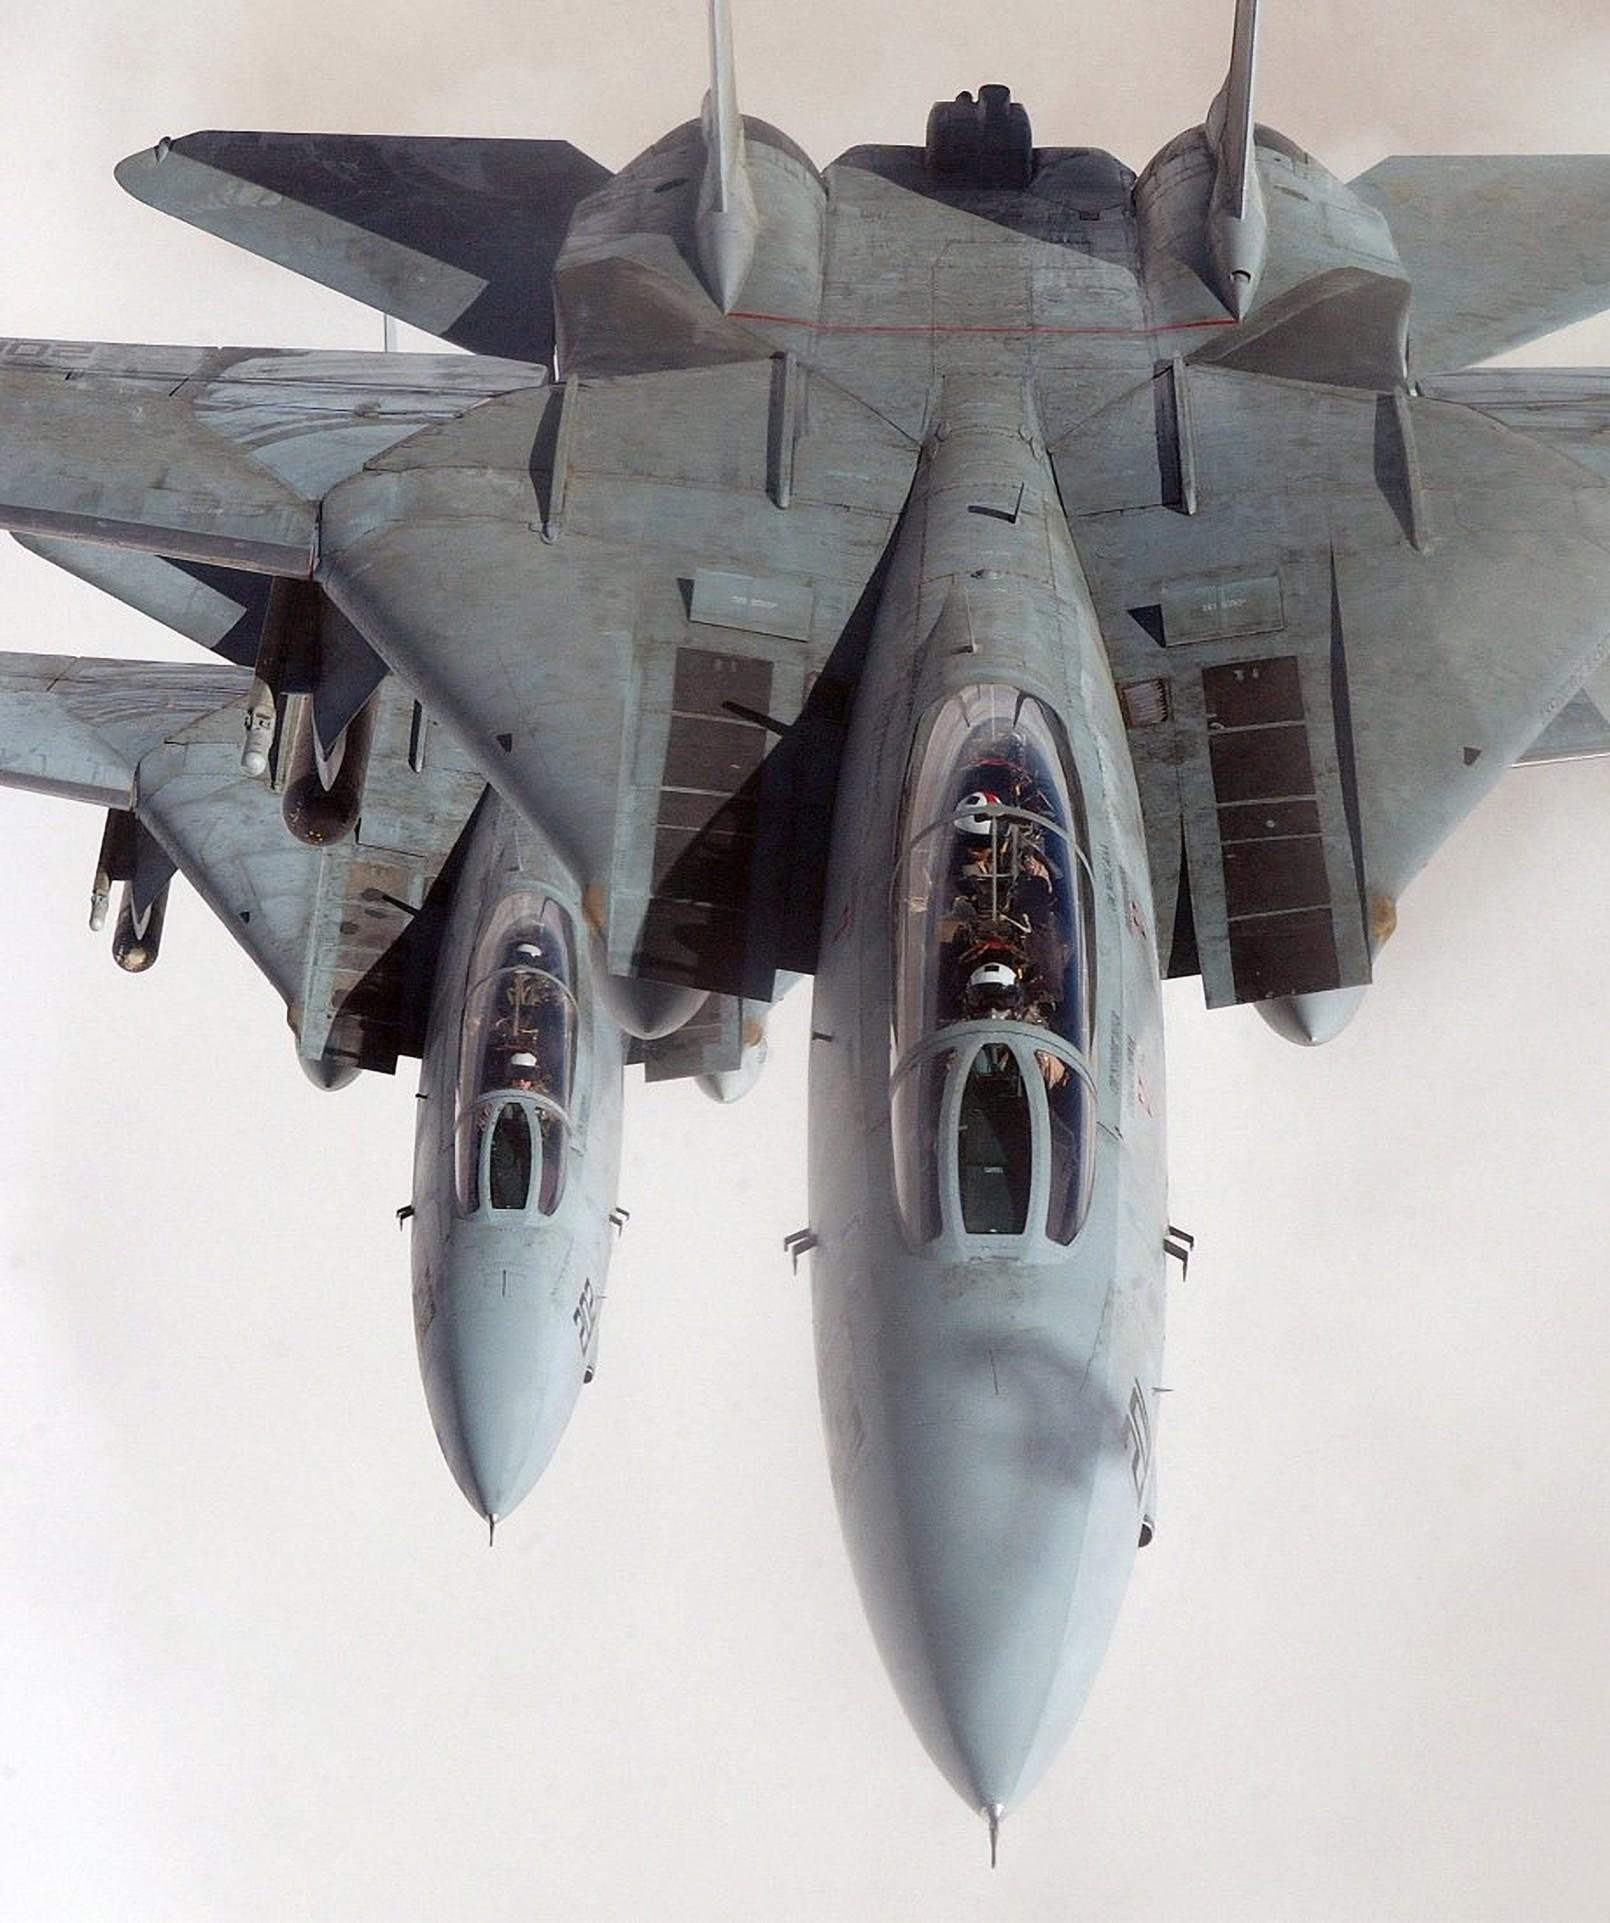 Res: 1610x1923, portrait display grumman f 14 tomcat jet fighter multirole fighter airplane  wallpaper and background